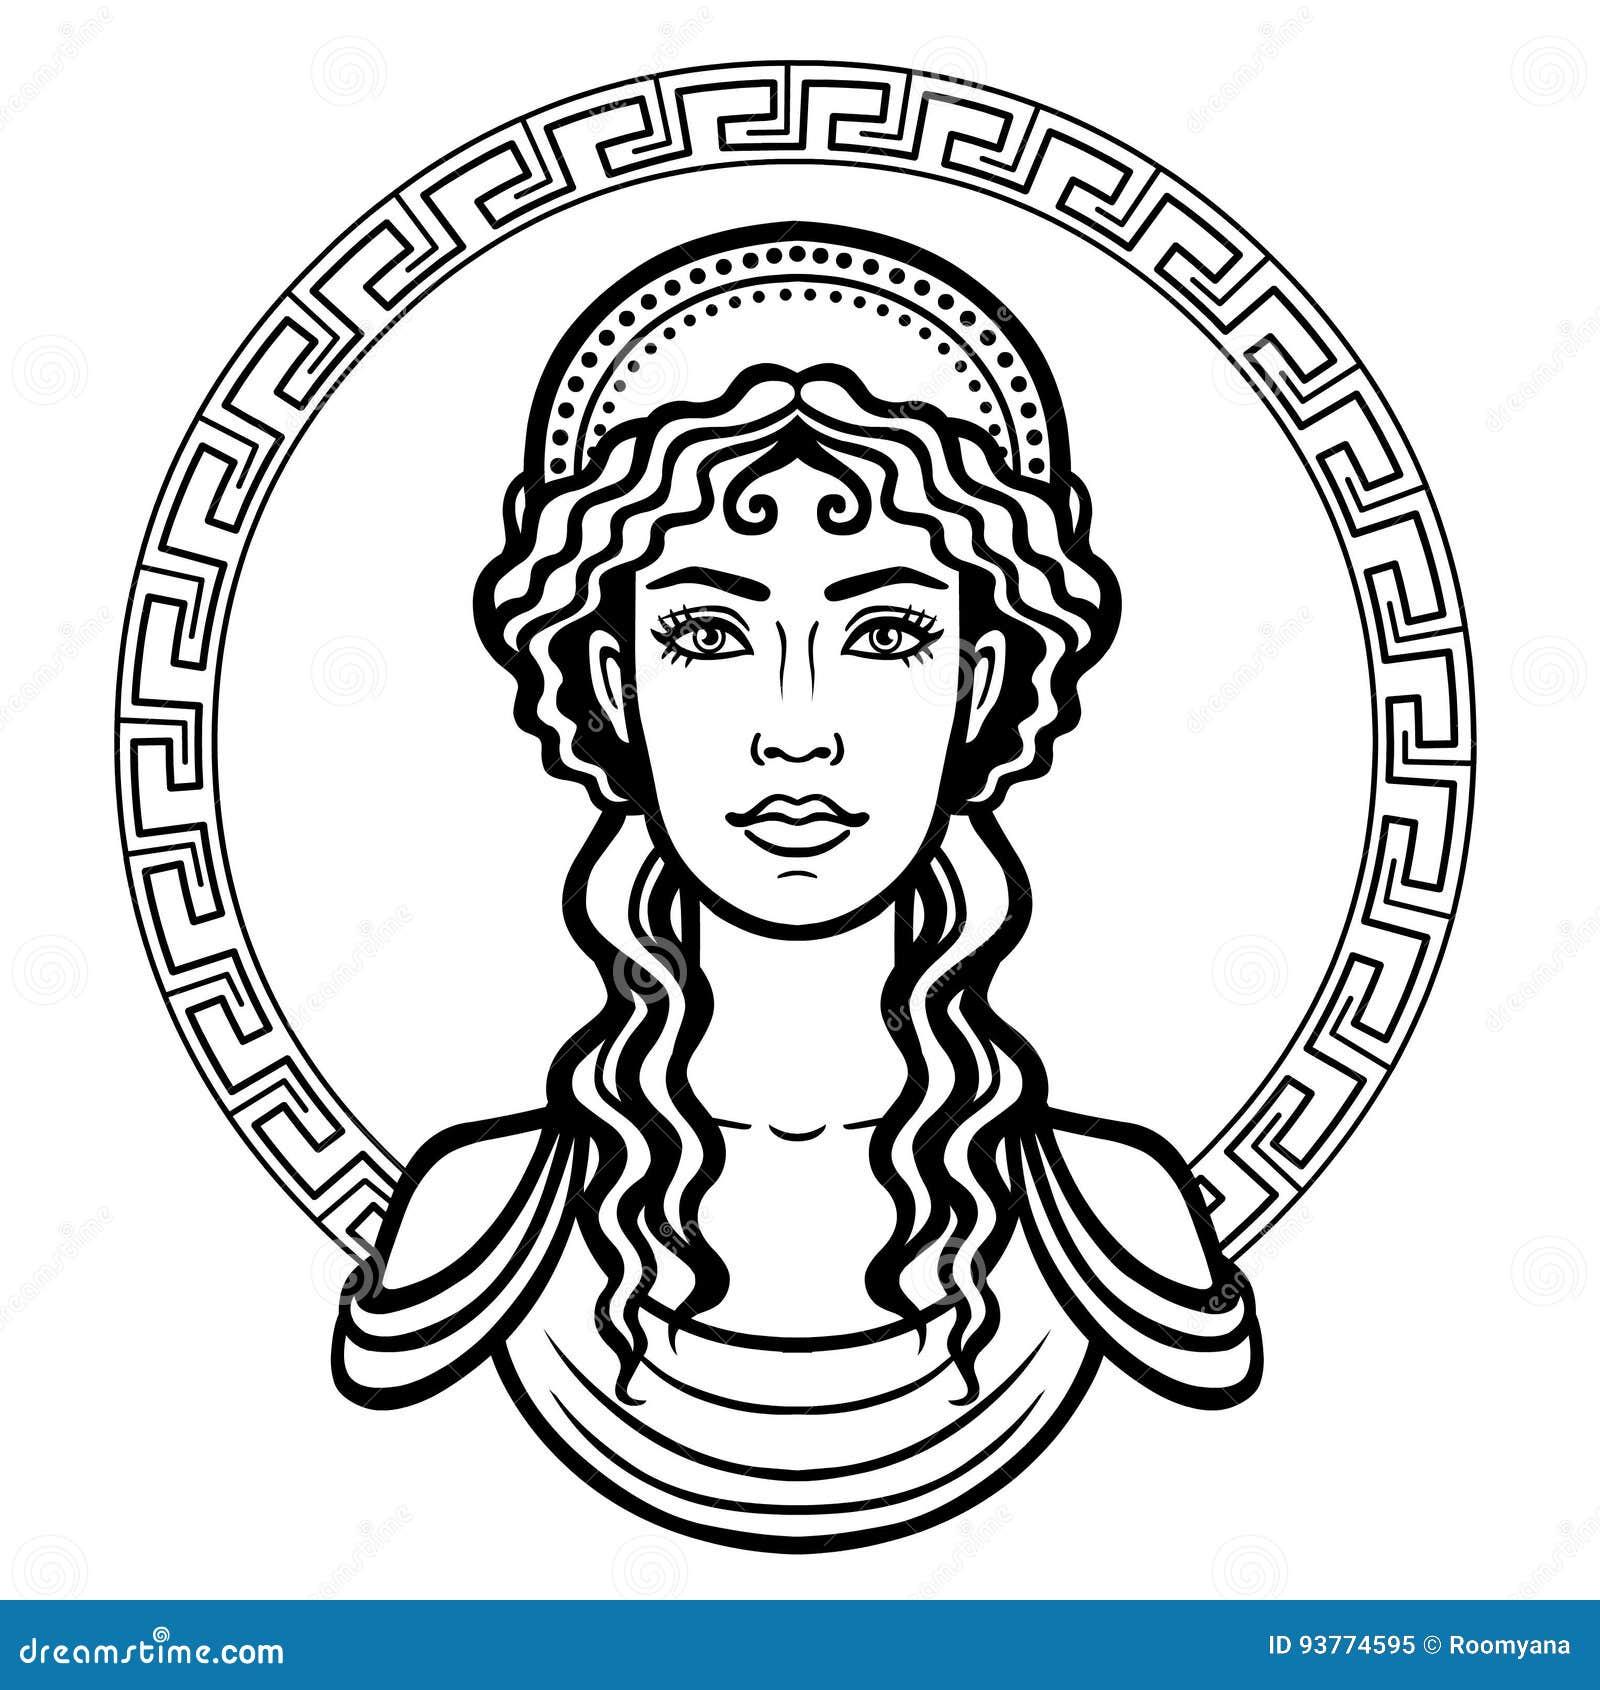 A Beautiful Cartoon Girl Face Linear Portrait Of The...